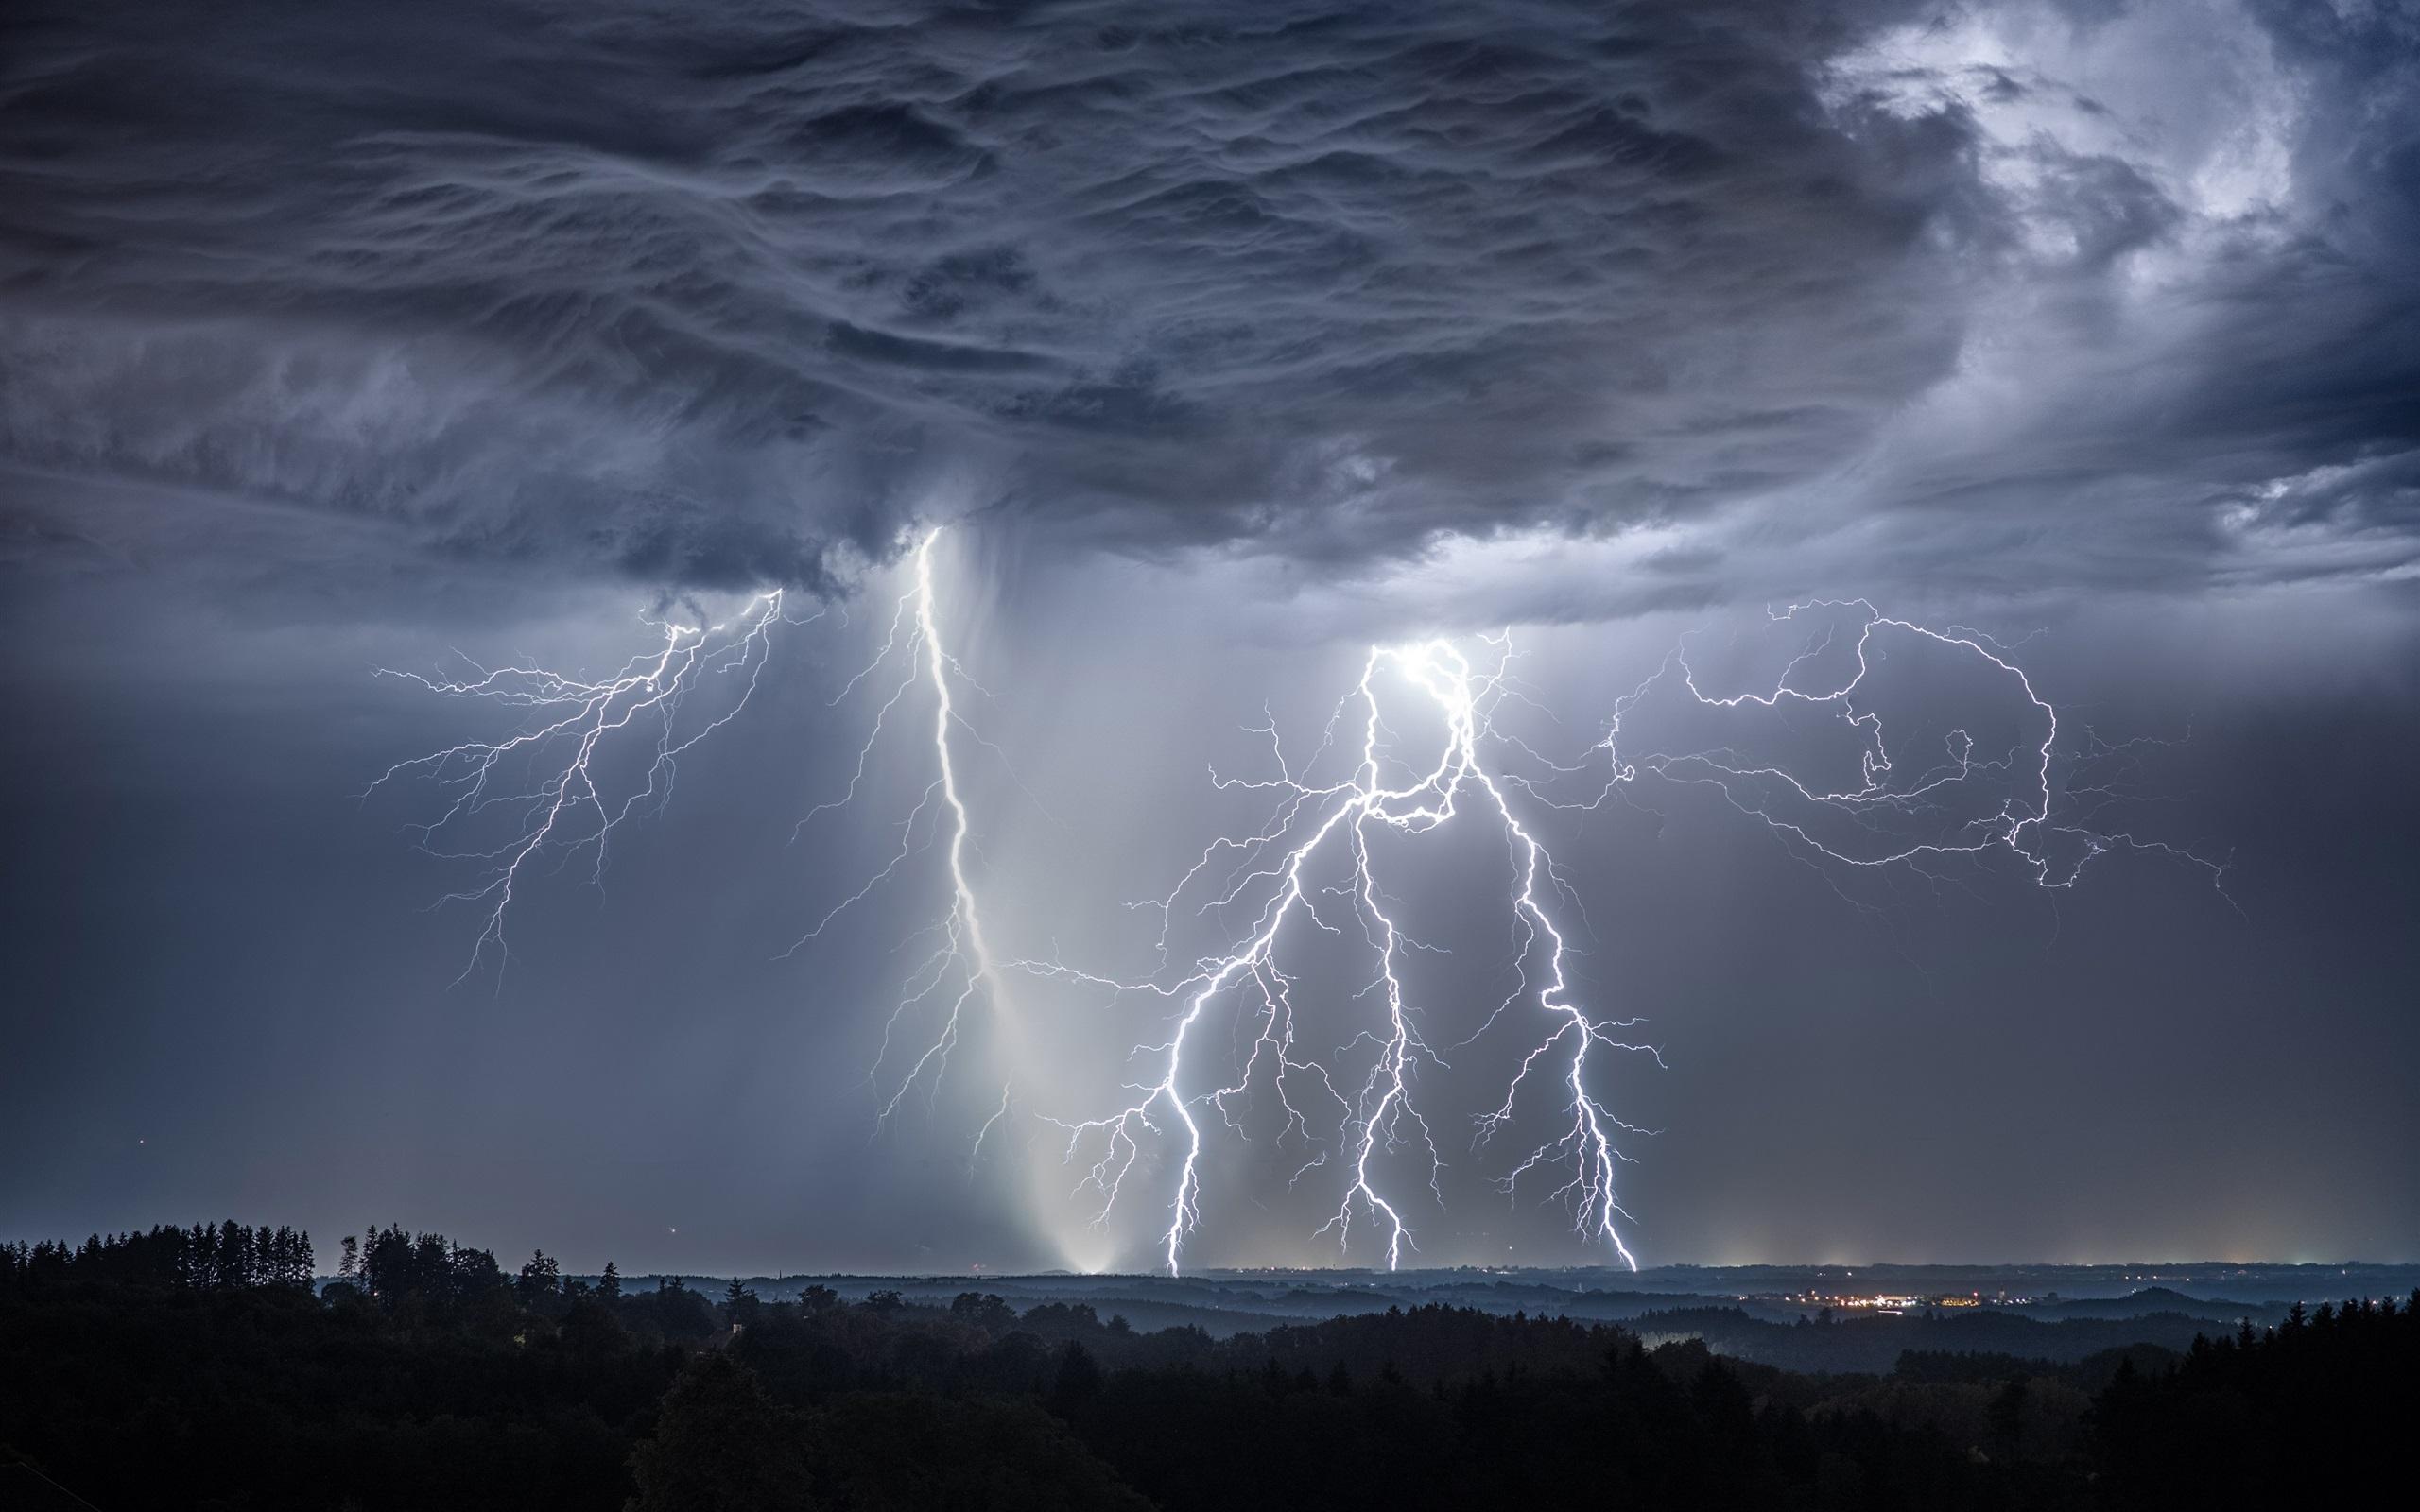 Fondos de pantalla tormenta rayos nubes alemania for Fondo de pantalla 4k para iphone